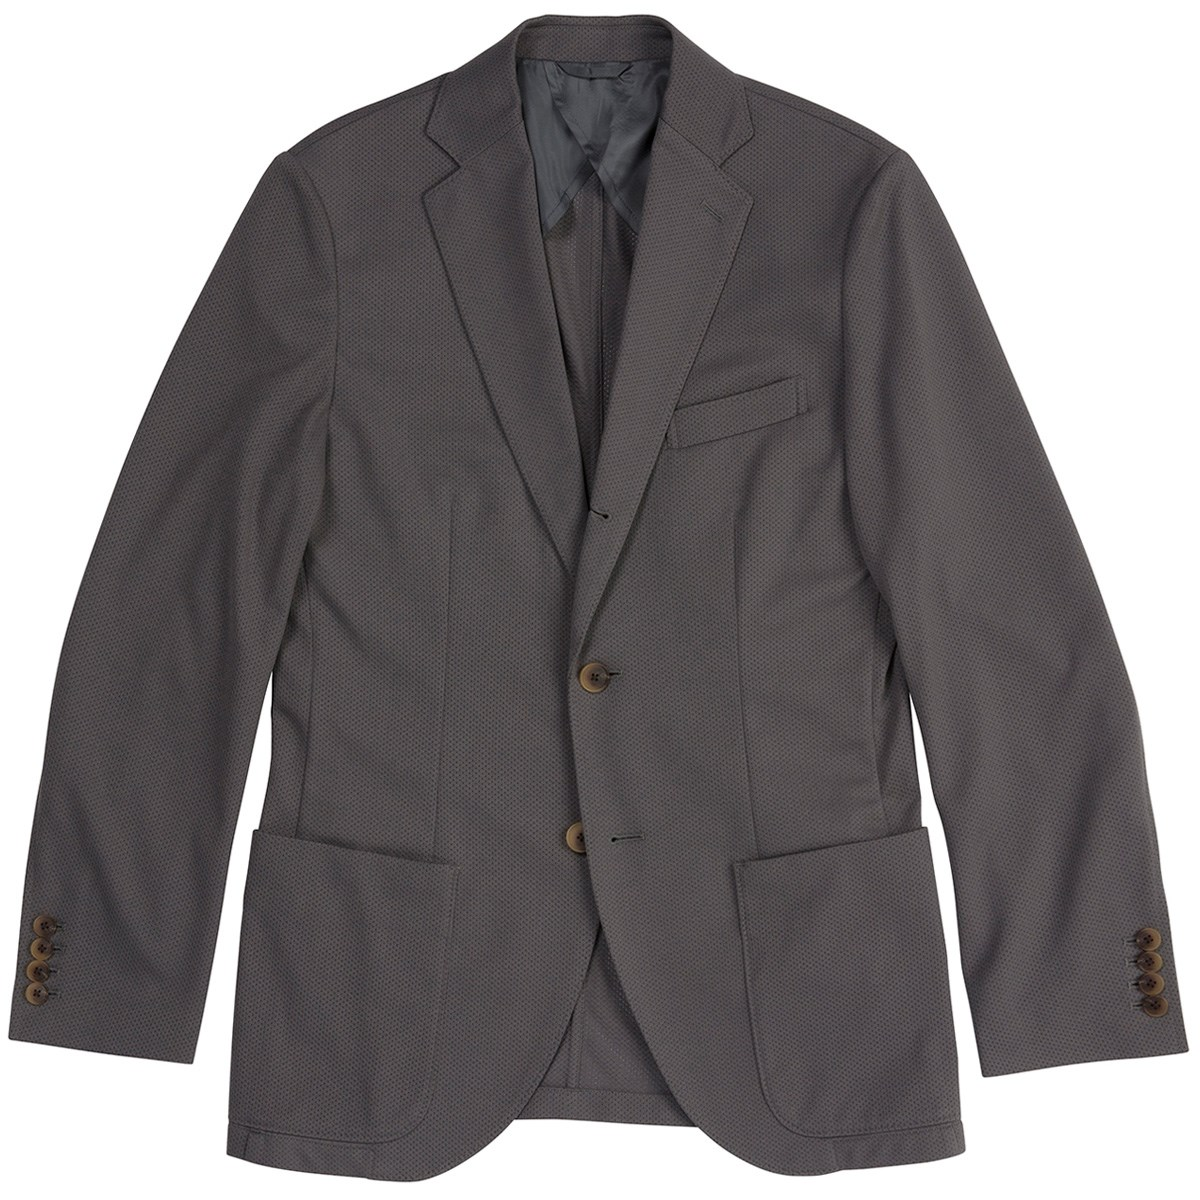 GDO オリジナル テクニカルメッシュジャケット